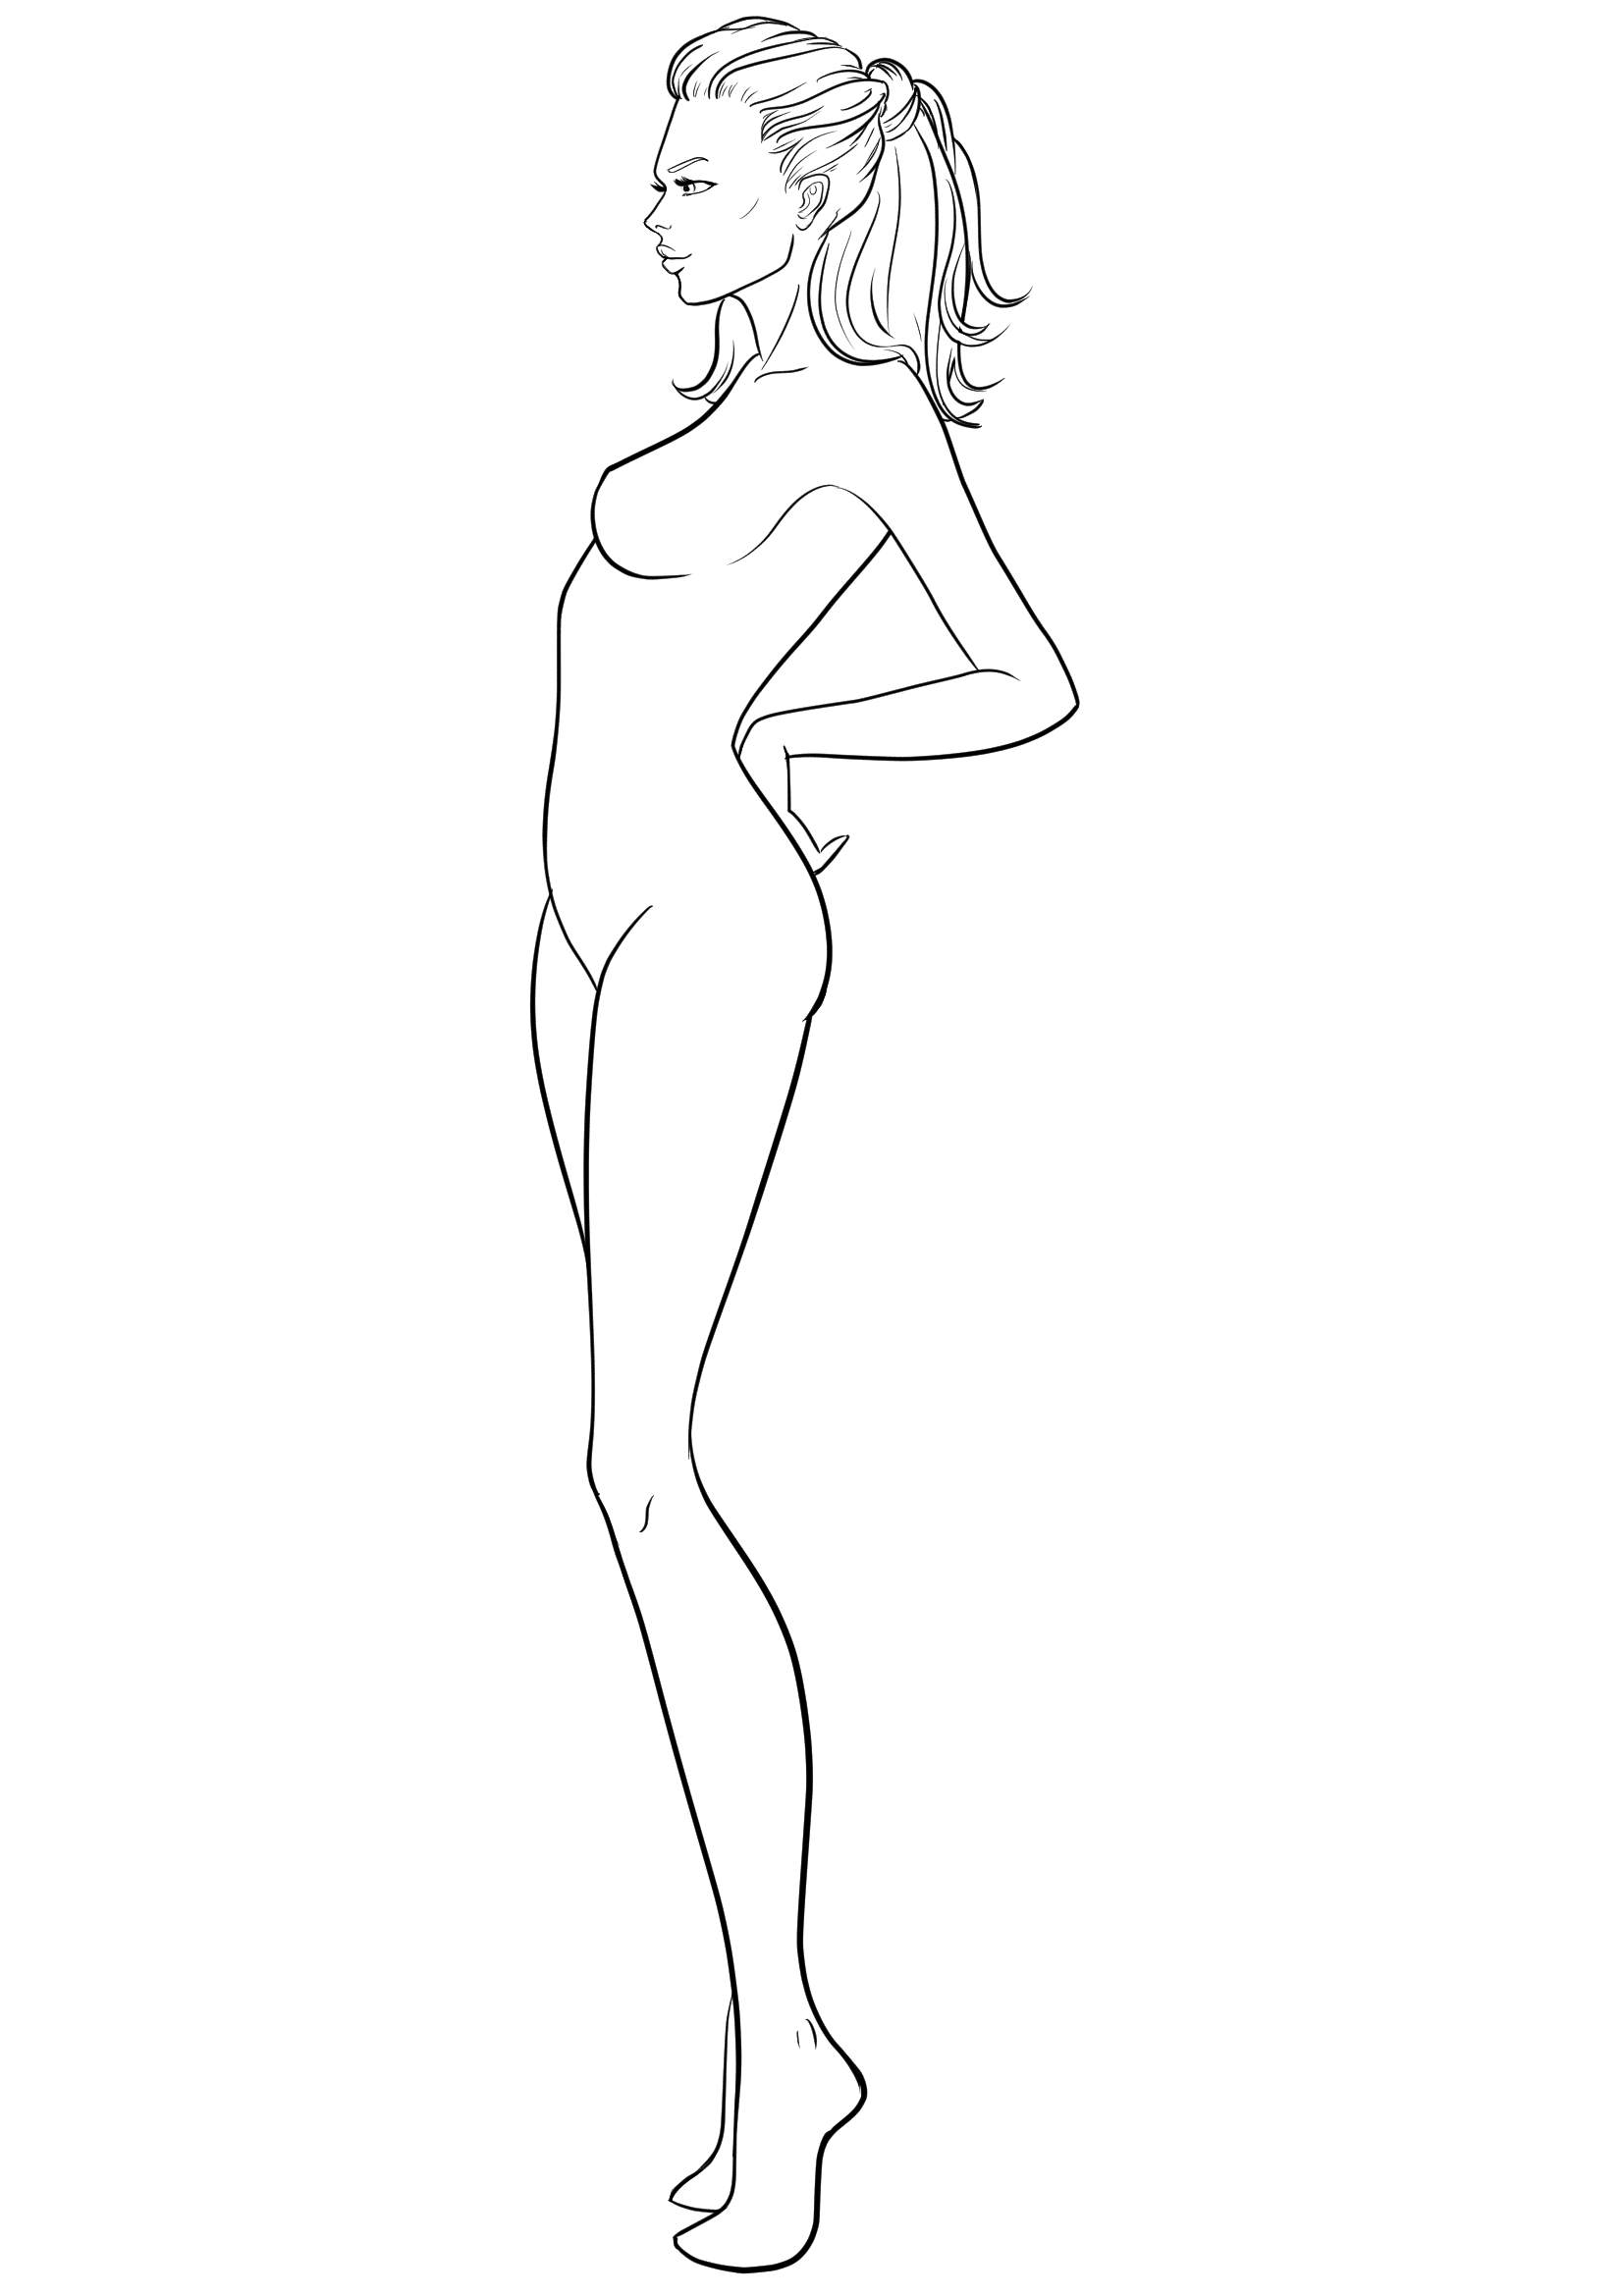 Download Free Fashion Croqui For Designers I Draw Fashion